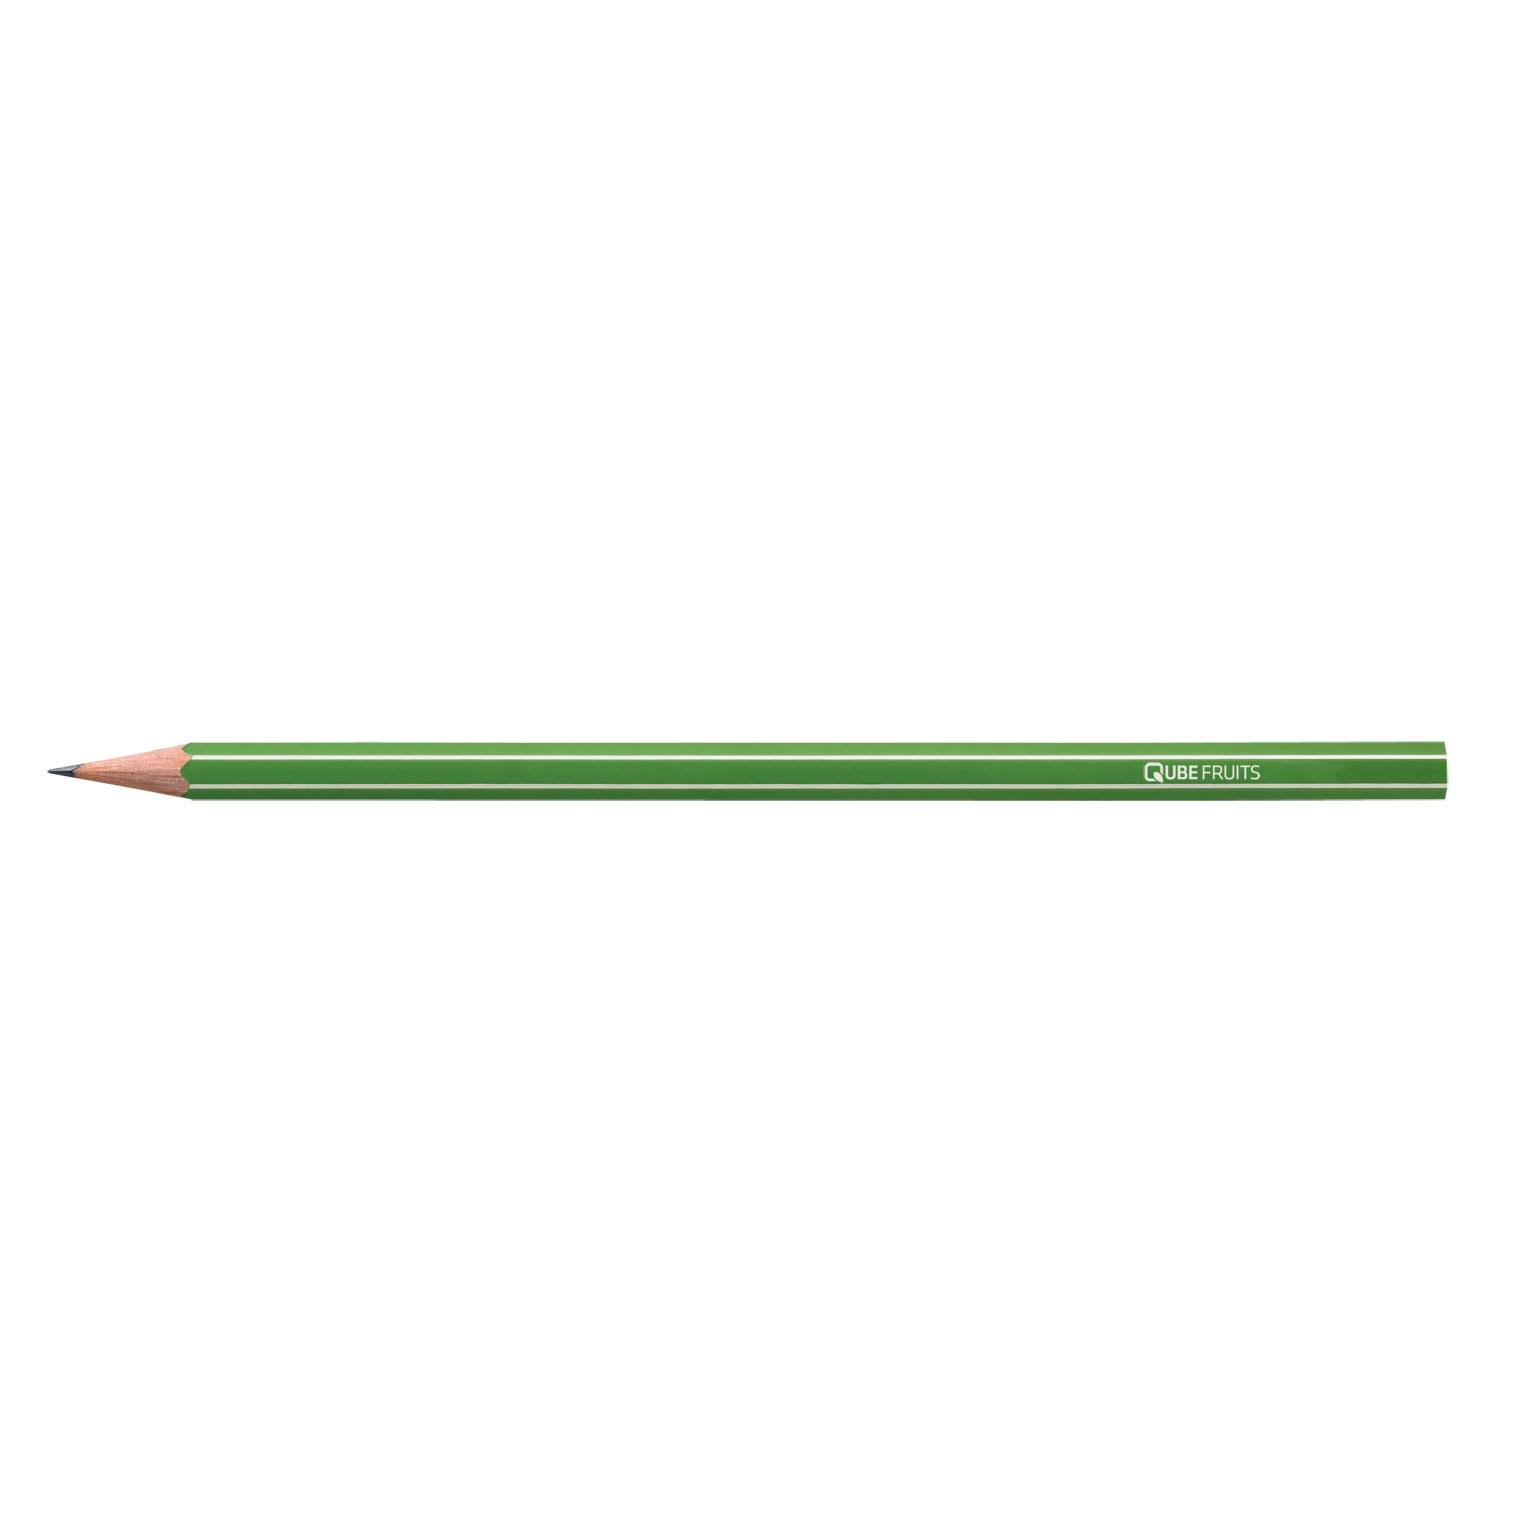 STABILO GREENgraph pencil as above, with eraser